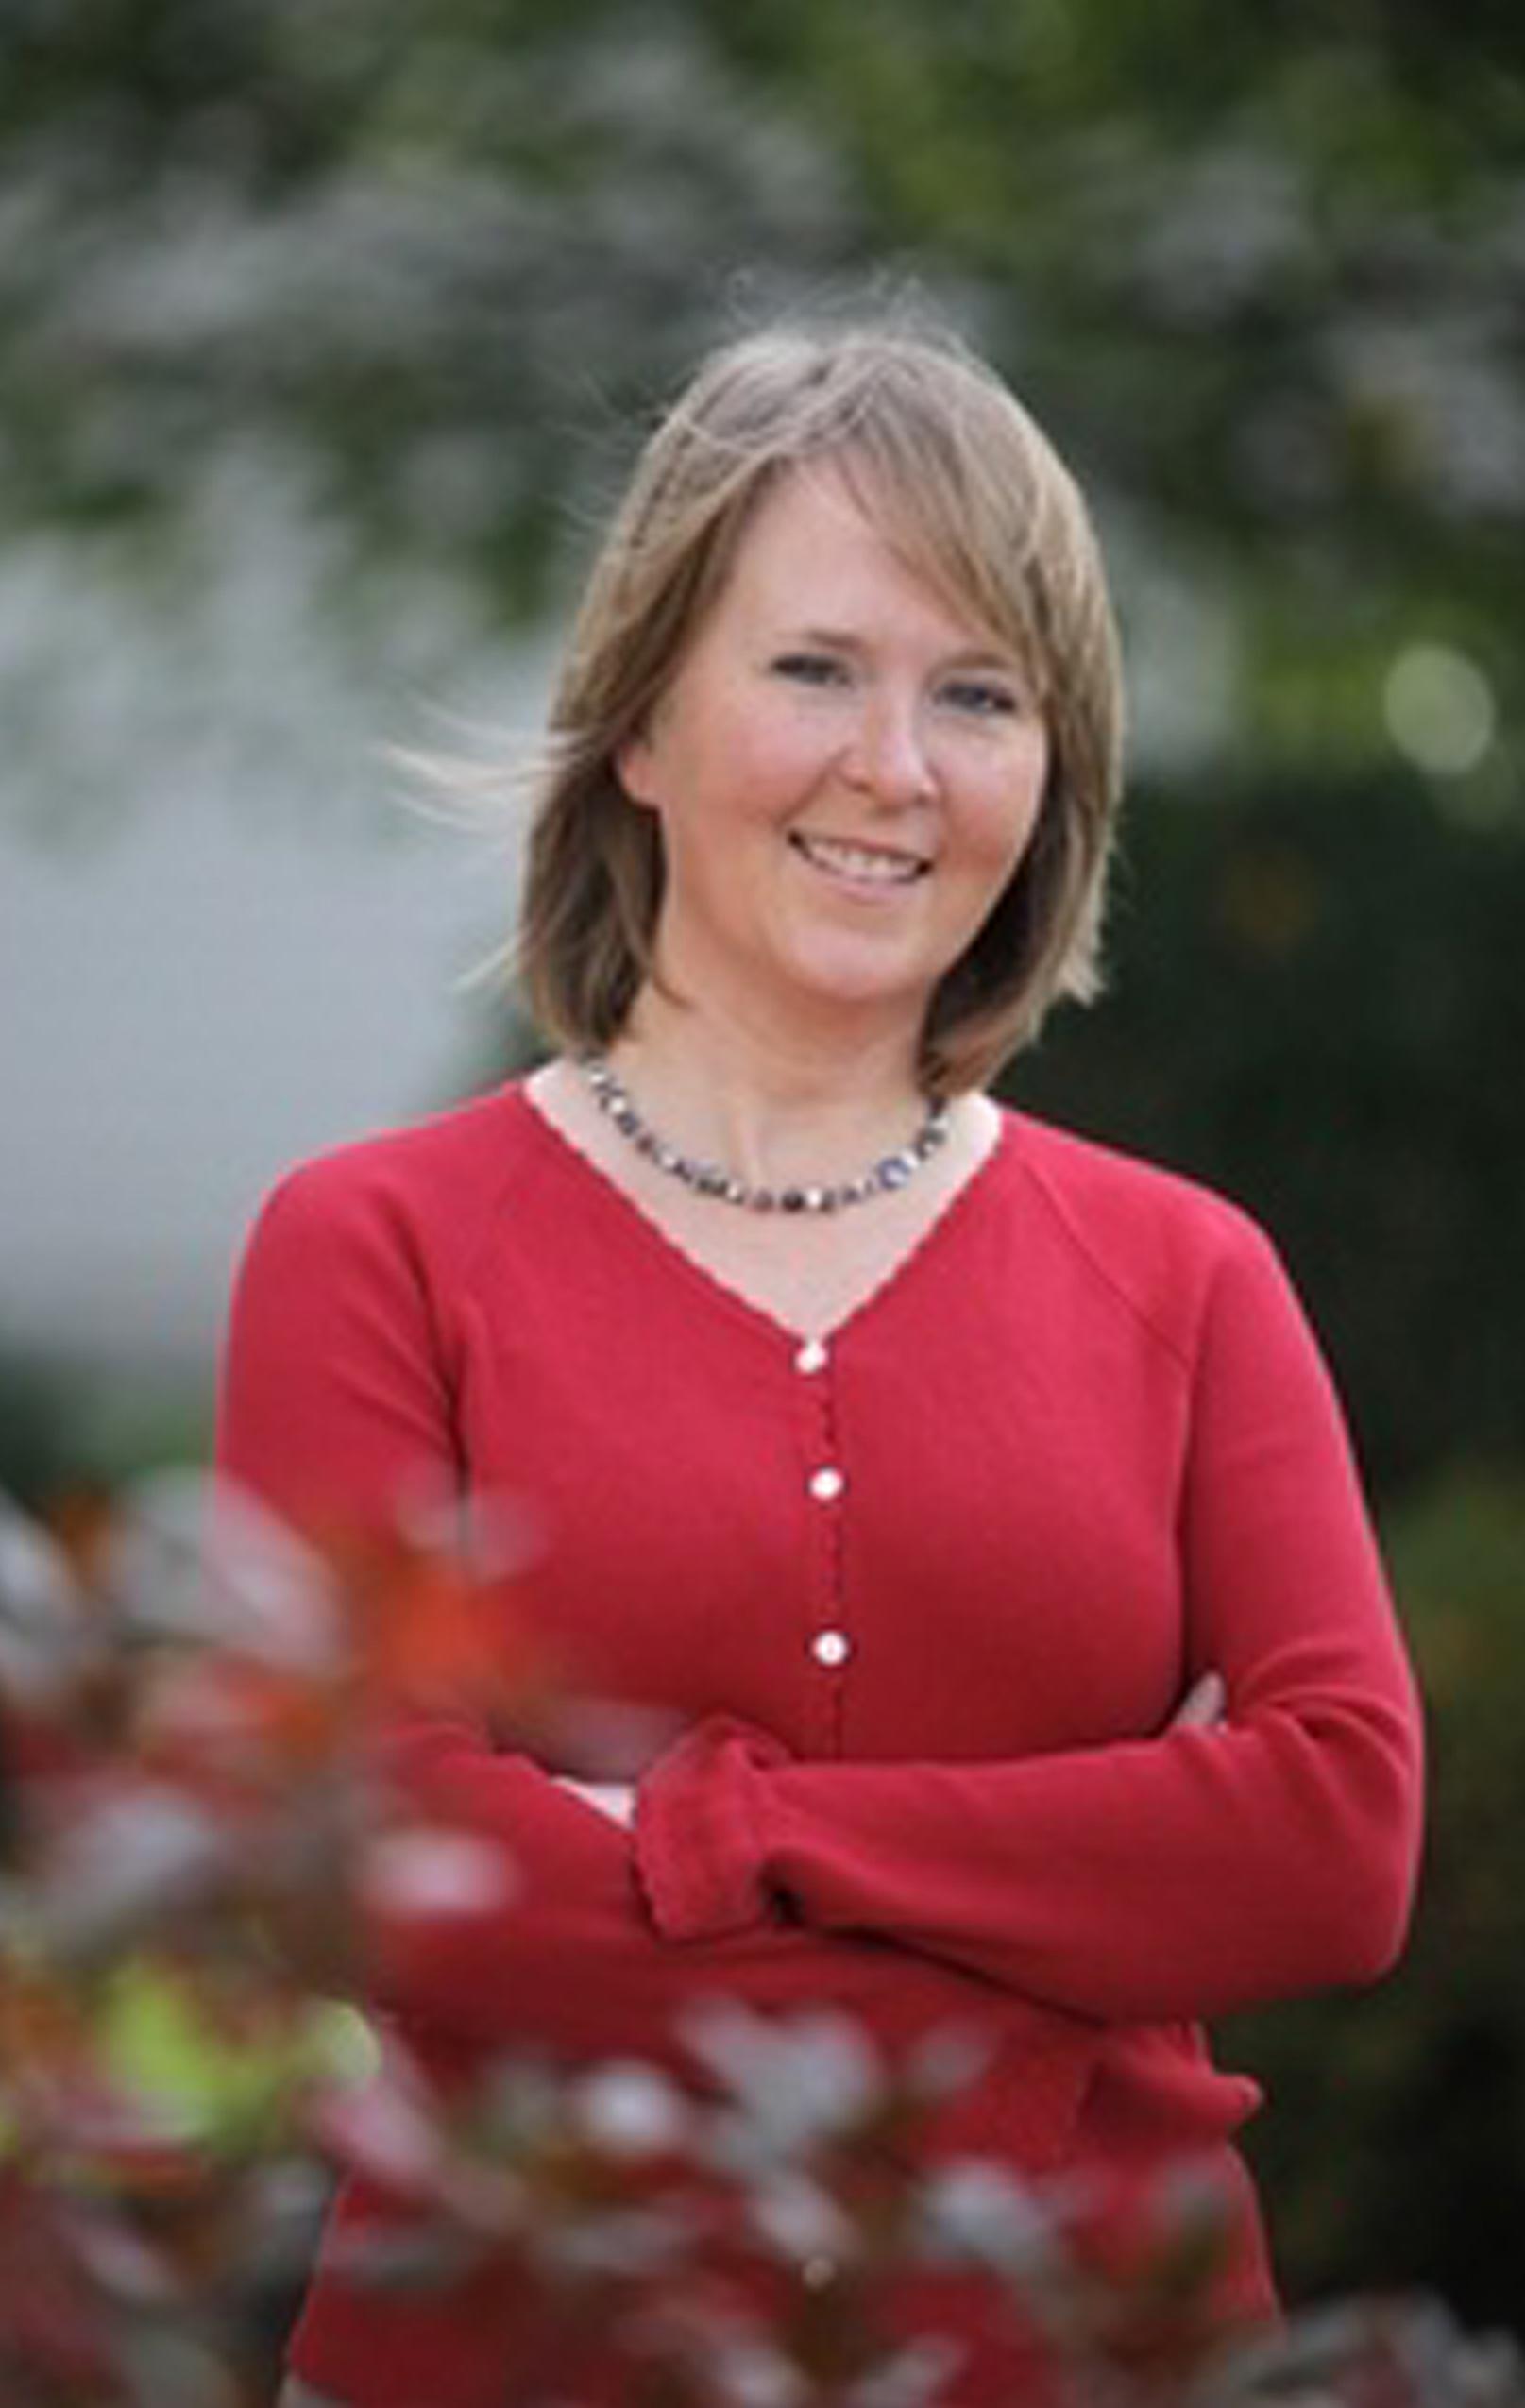 Sally Bacchetta, adoptive mother and author